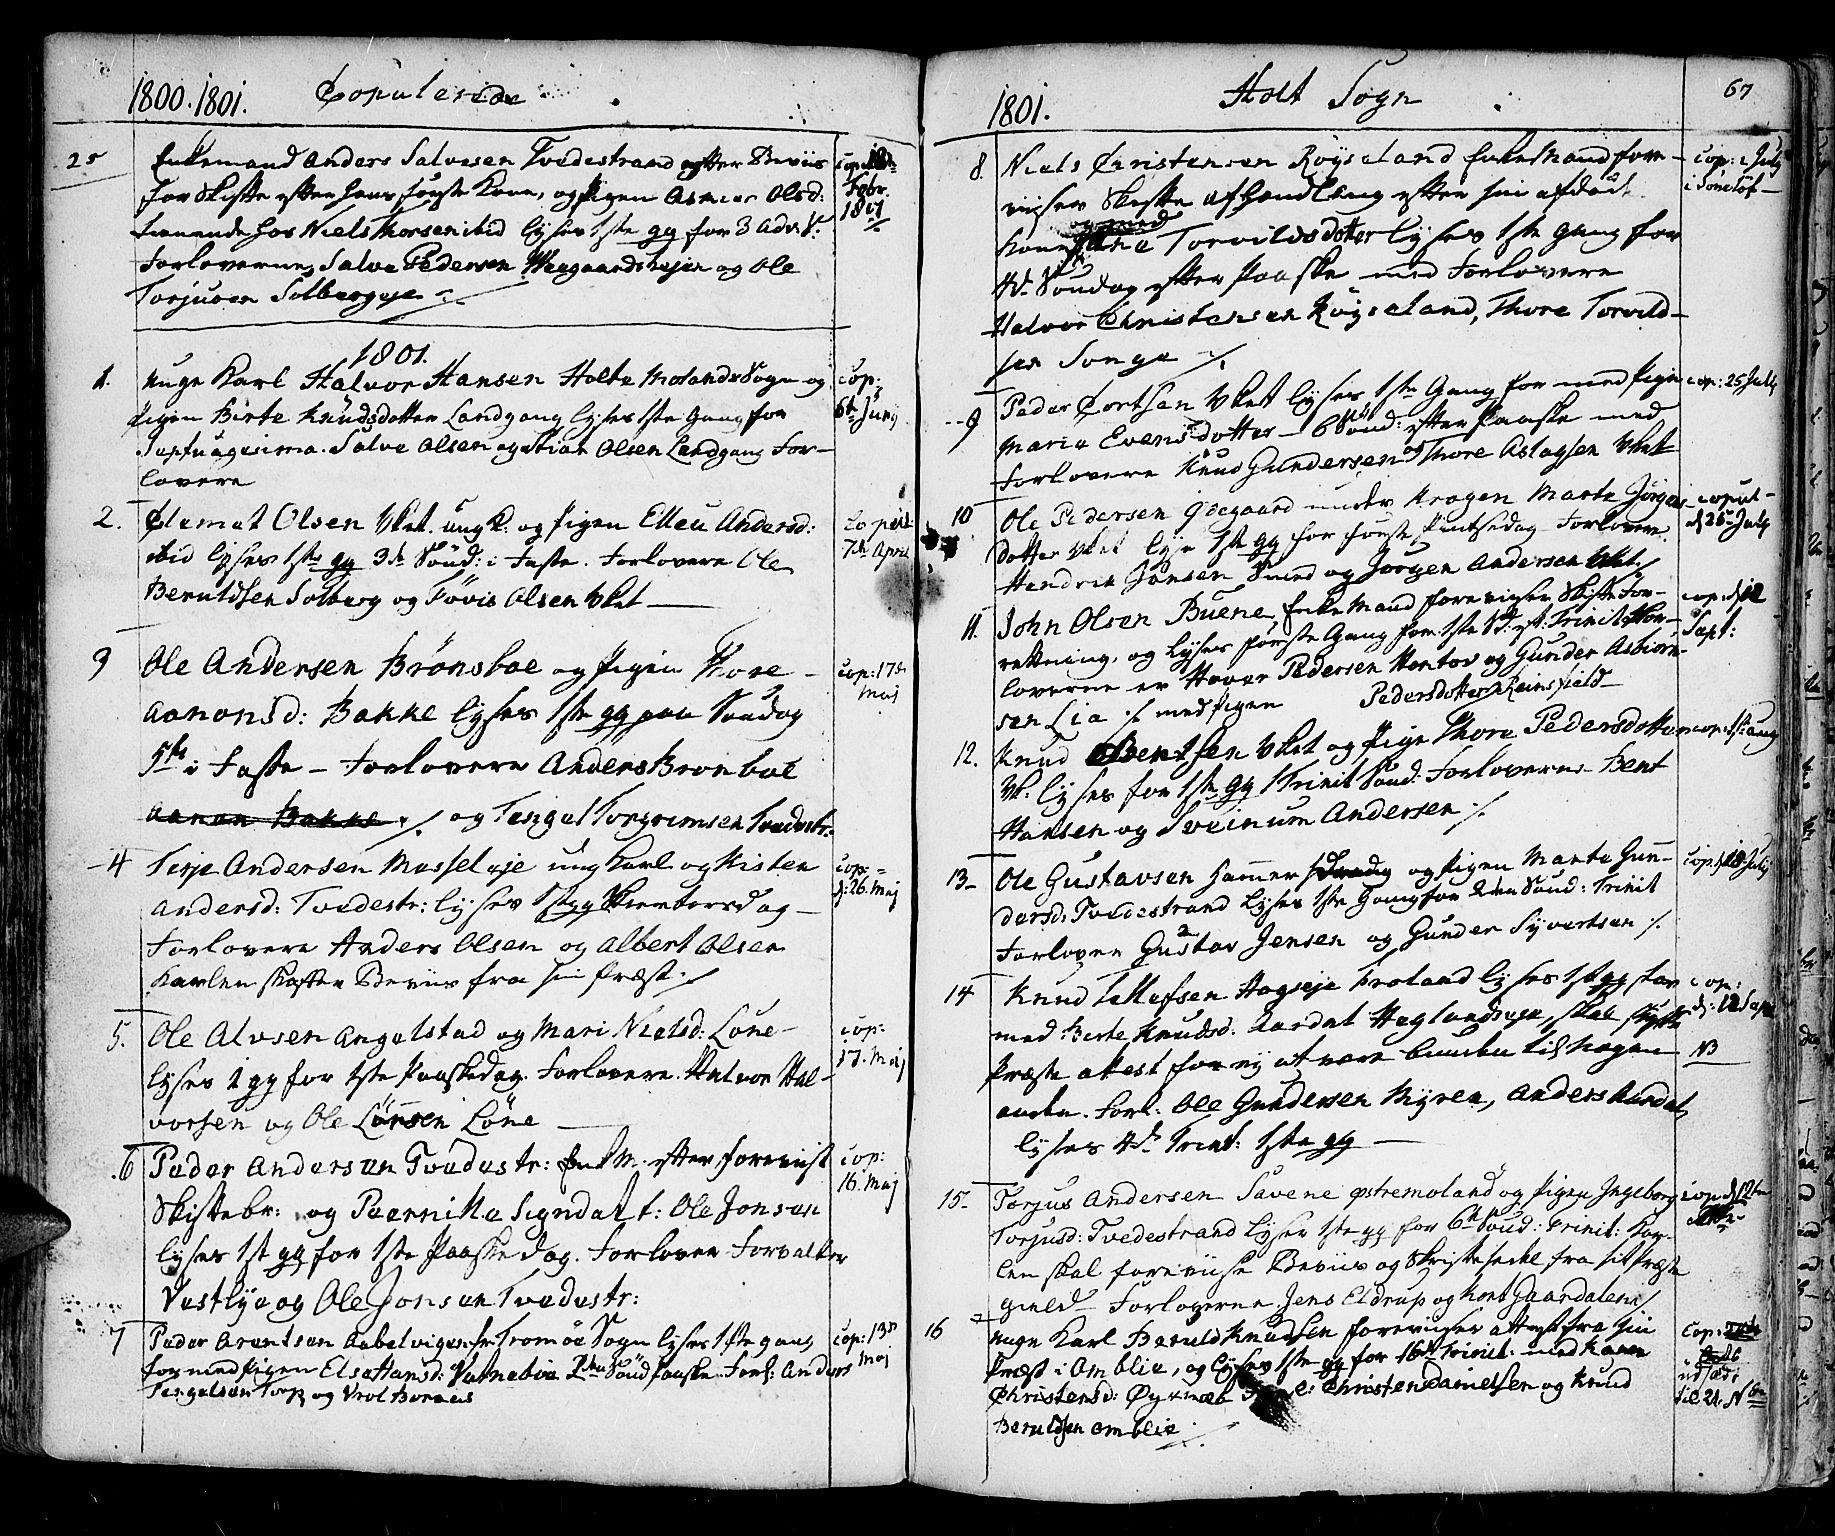 SAK, Holt sokneprestkontor, F/Fa/L0004: Ministerialbok nr. A 4, 1799-1813, s. 67